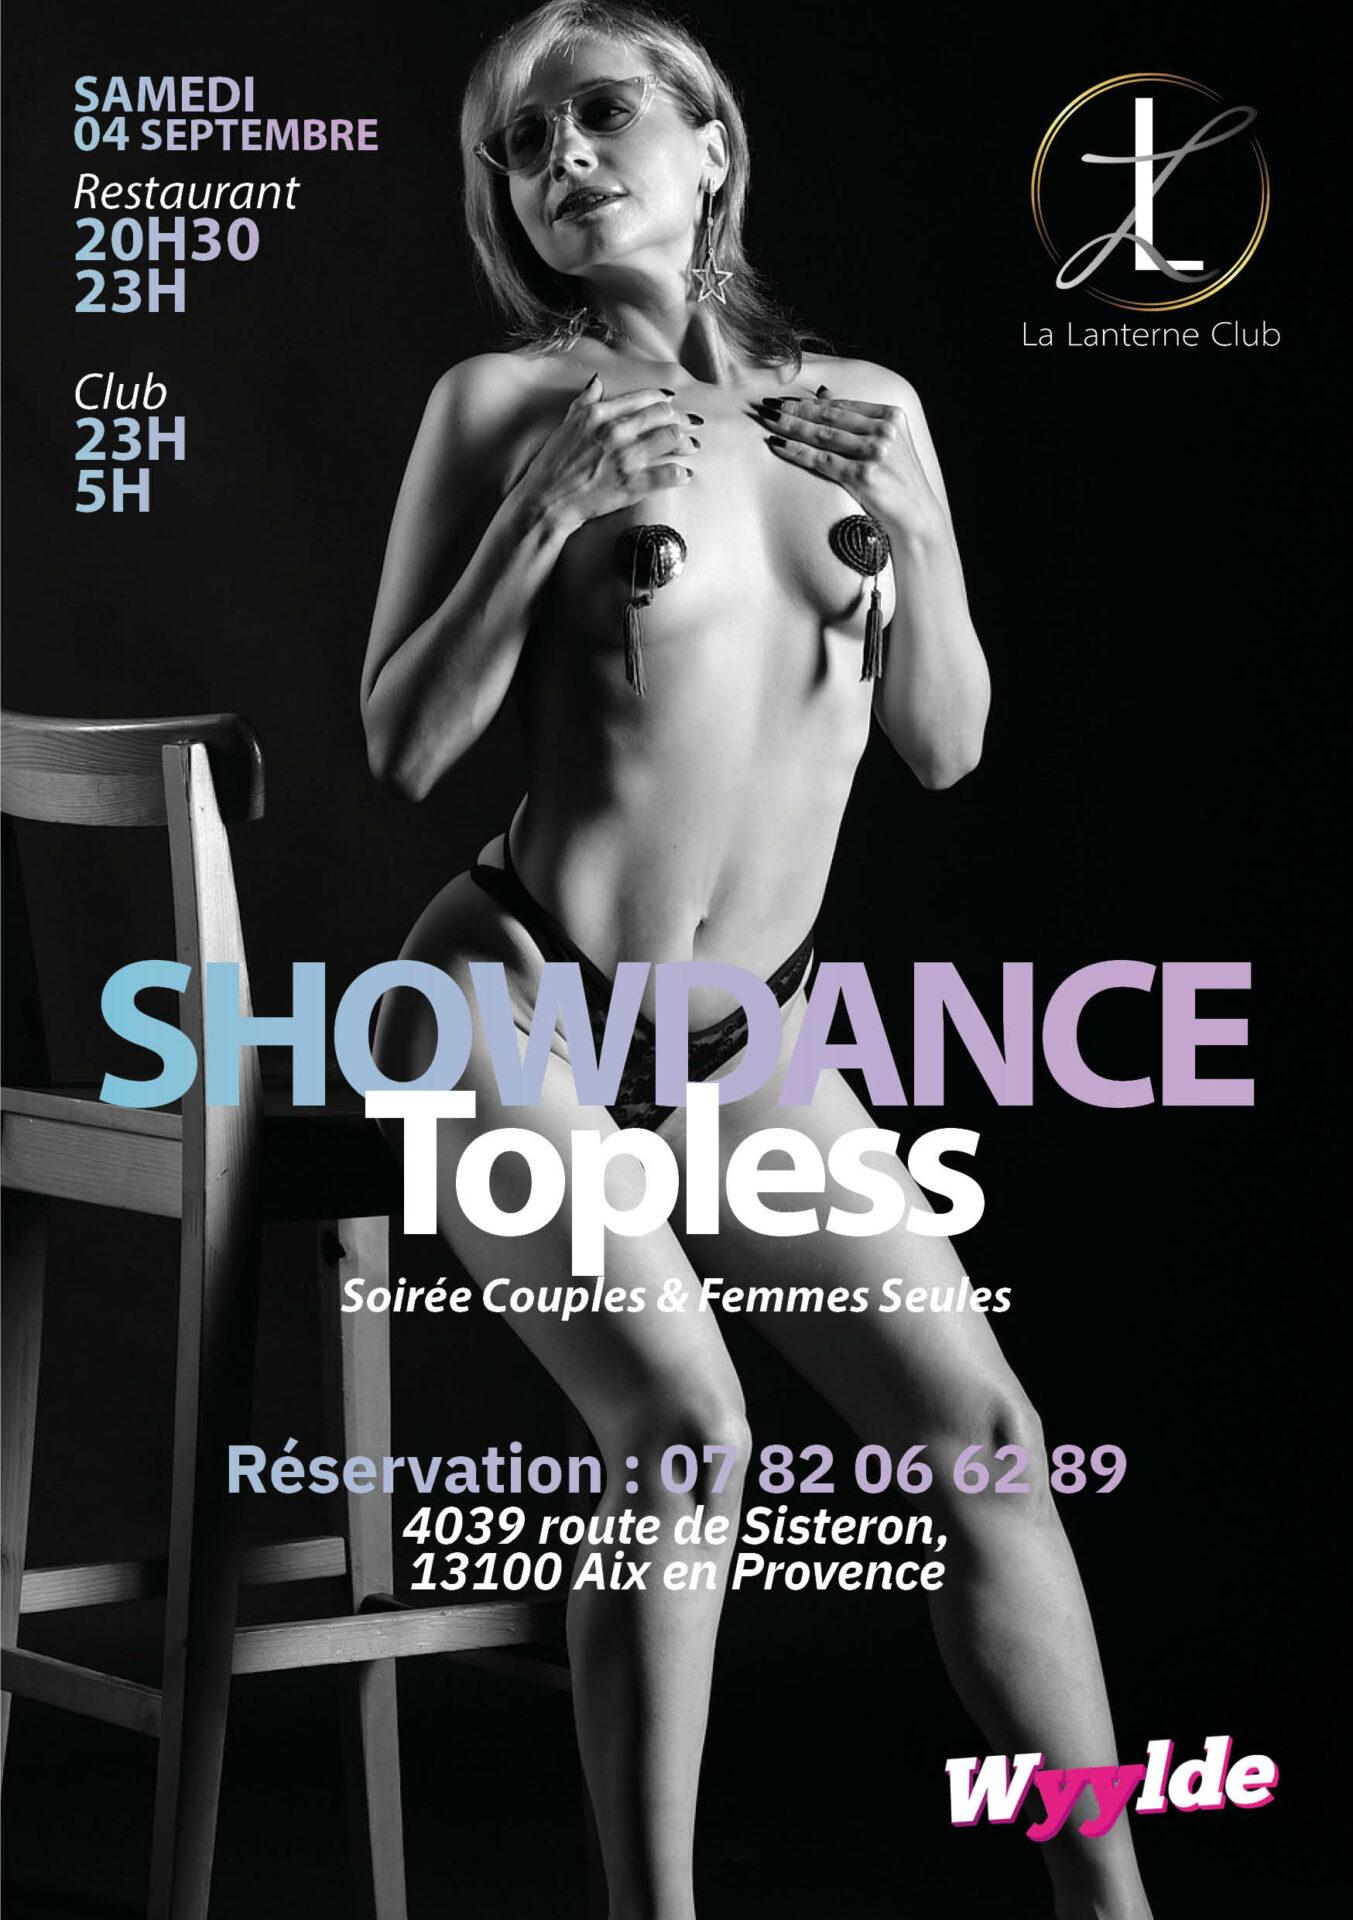 showdance topless samedi 04 septembre 2021